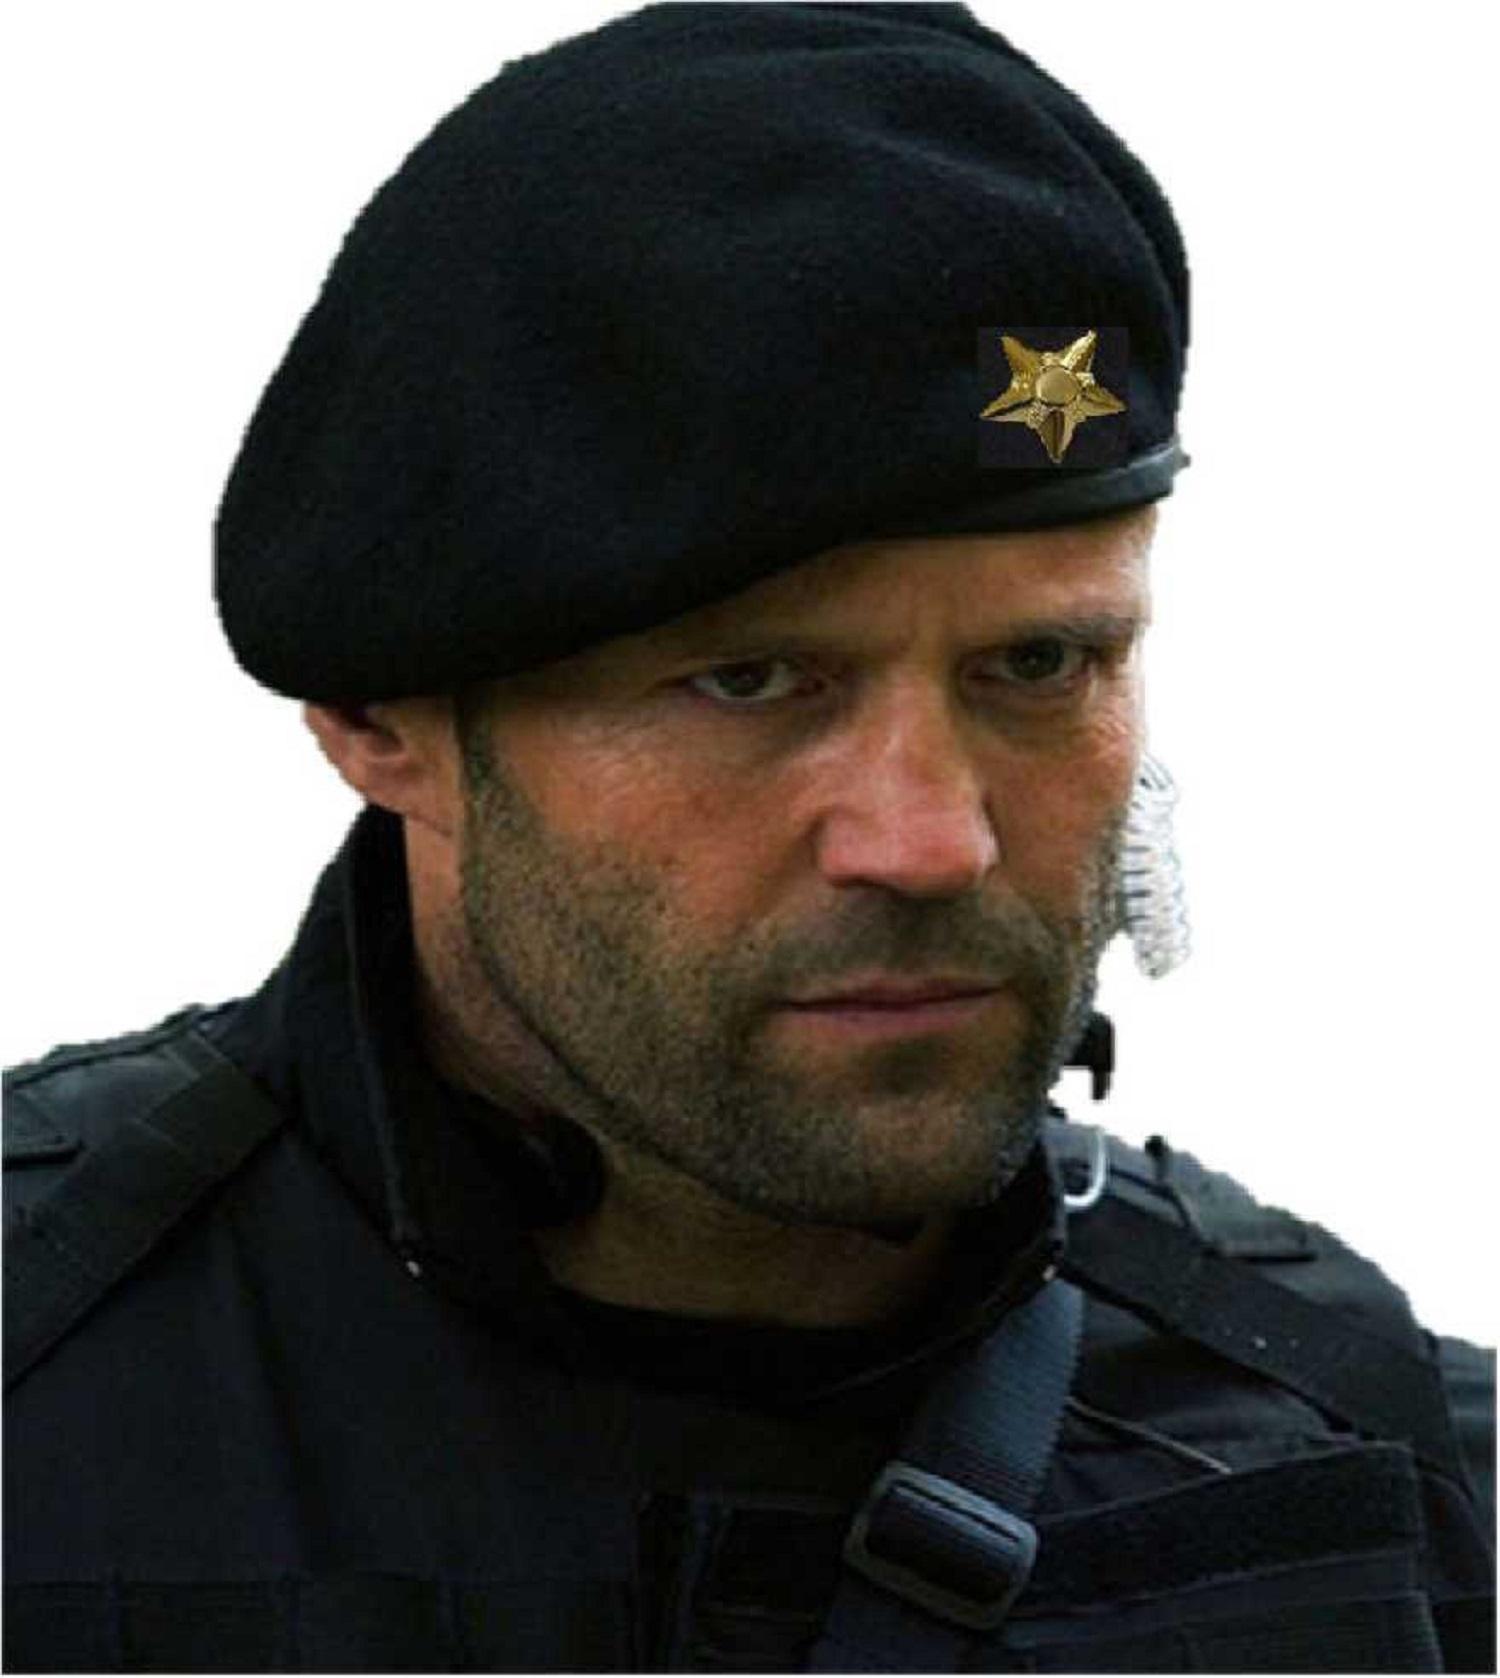 Unisex French Woolen Beret Cap, Rajputana Cap, Traditional Army Style Cap, Classic European Hat, Woolen Beret Cap